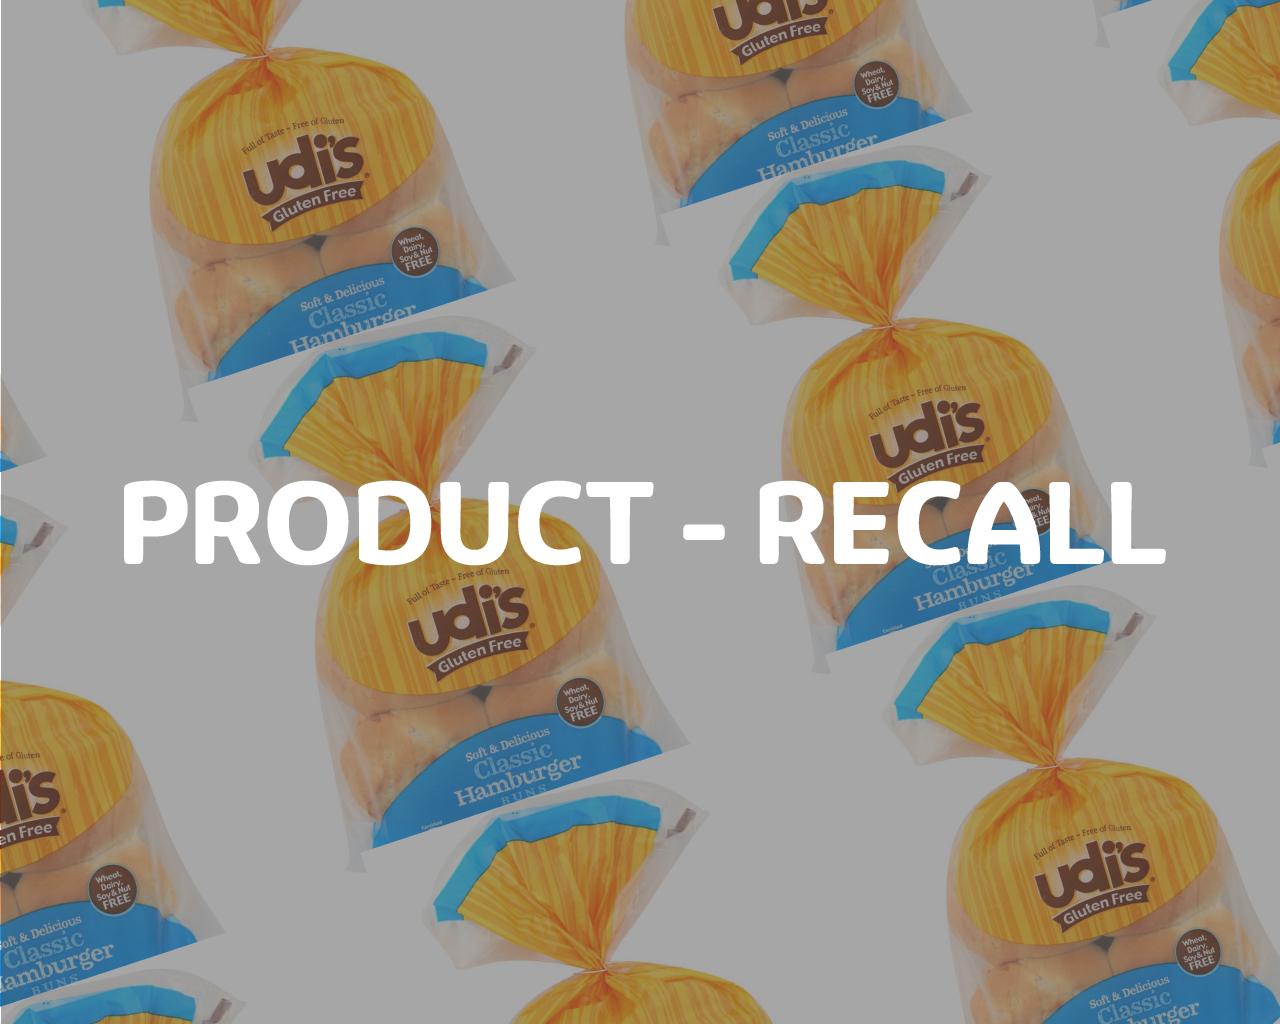 Product-Recall-Udi-Hamburger-Buns